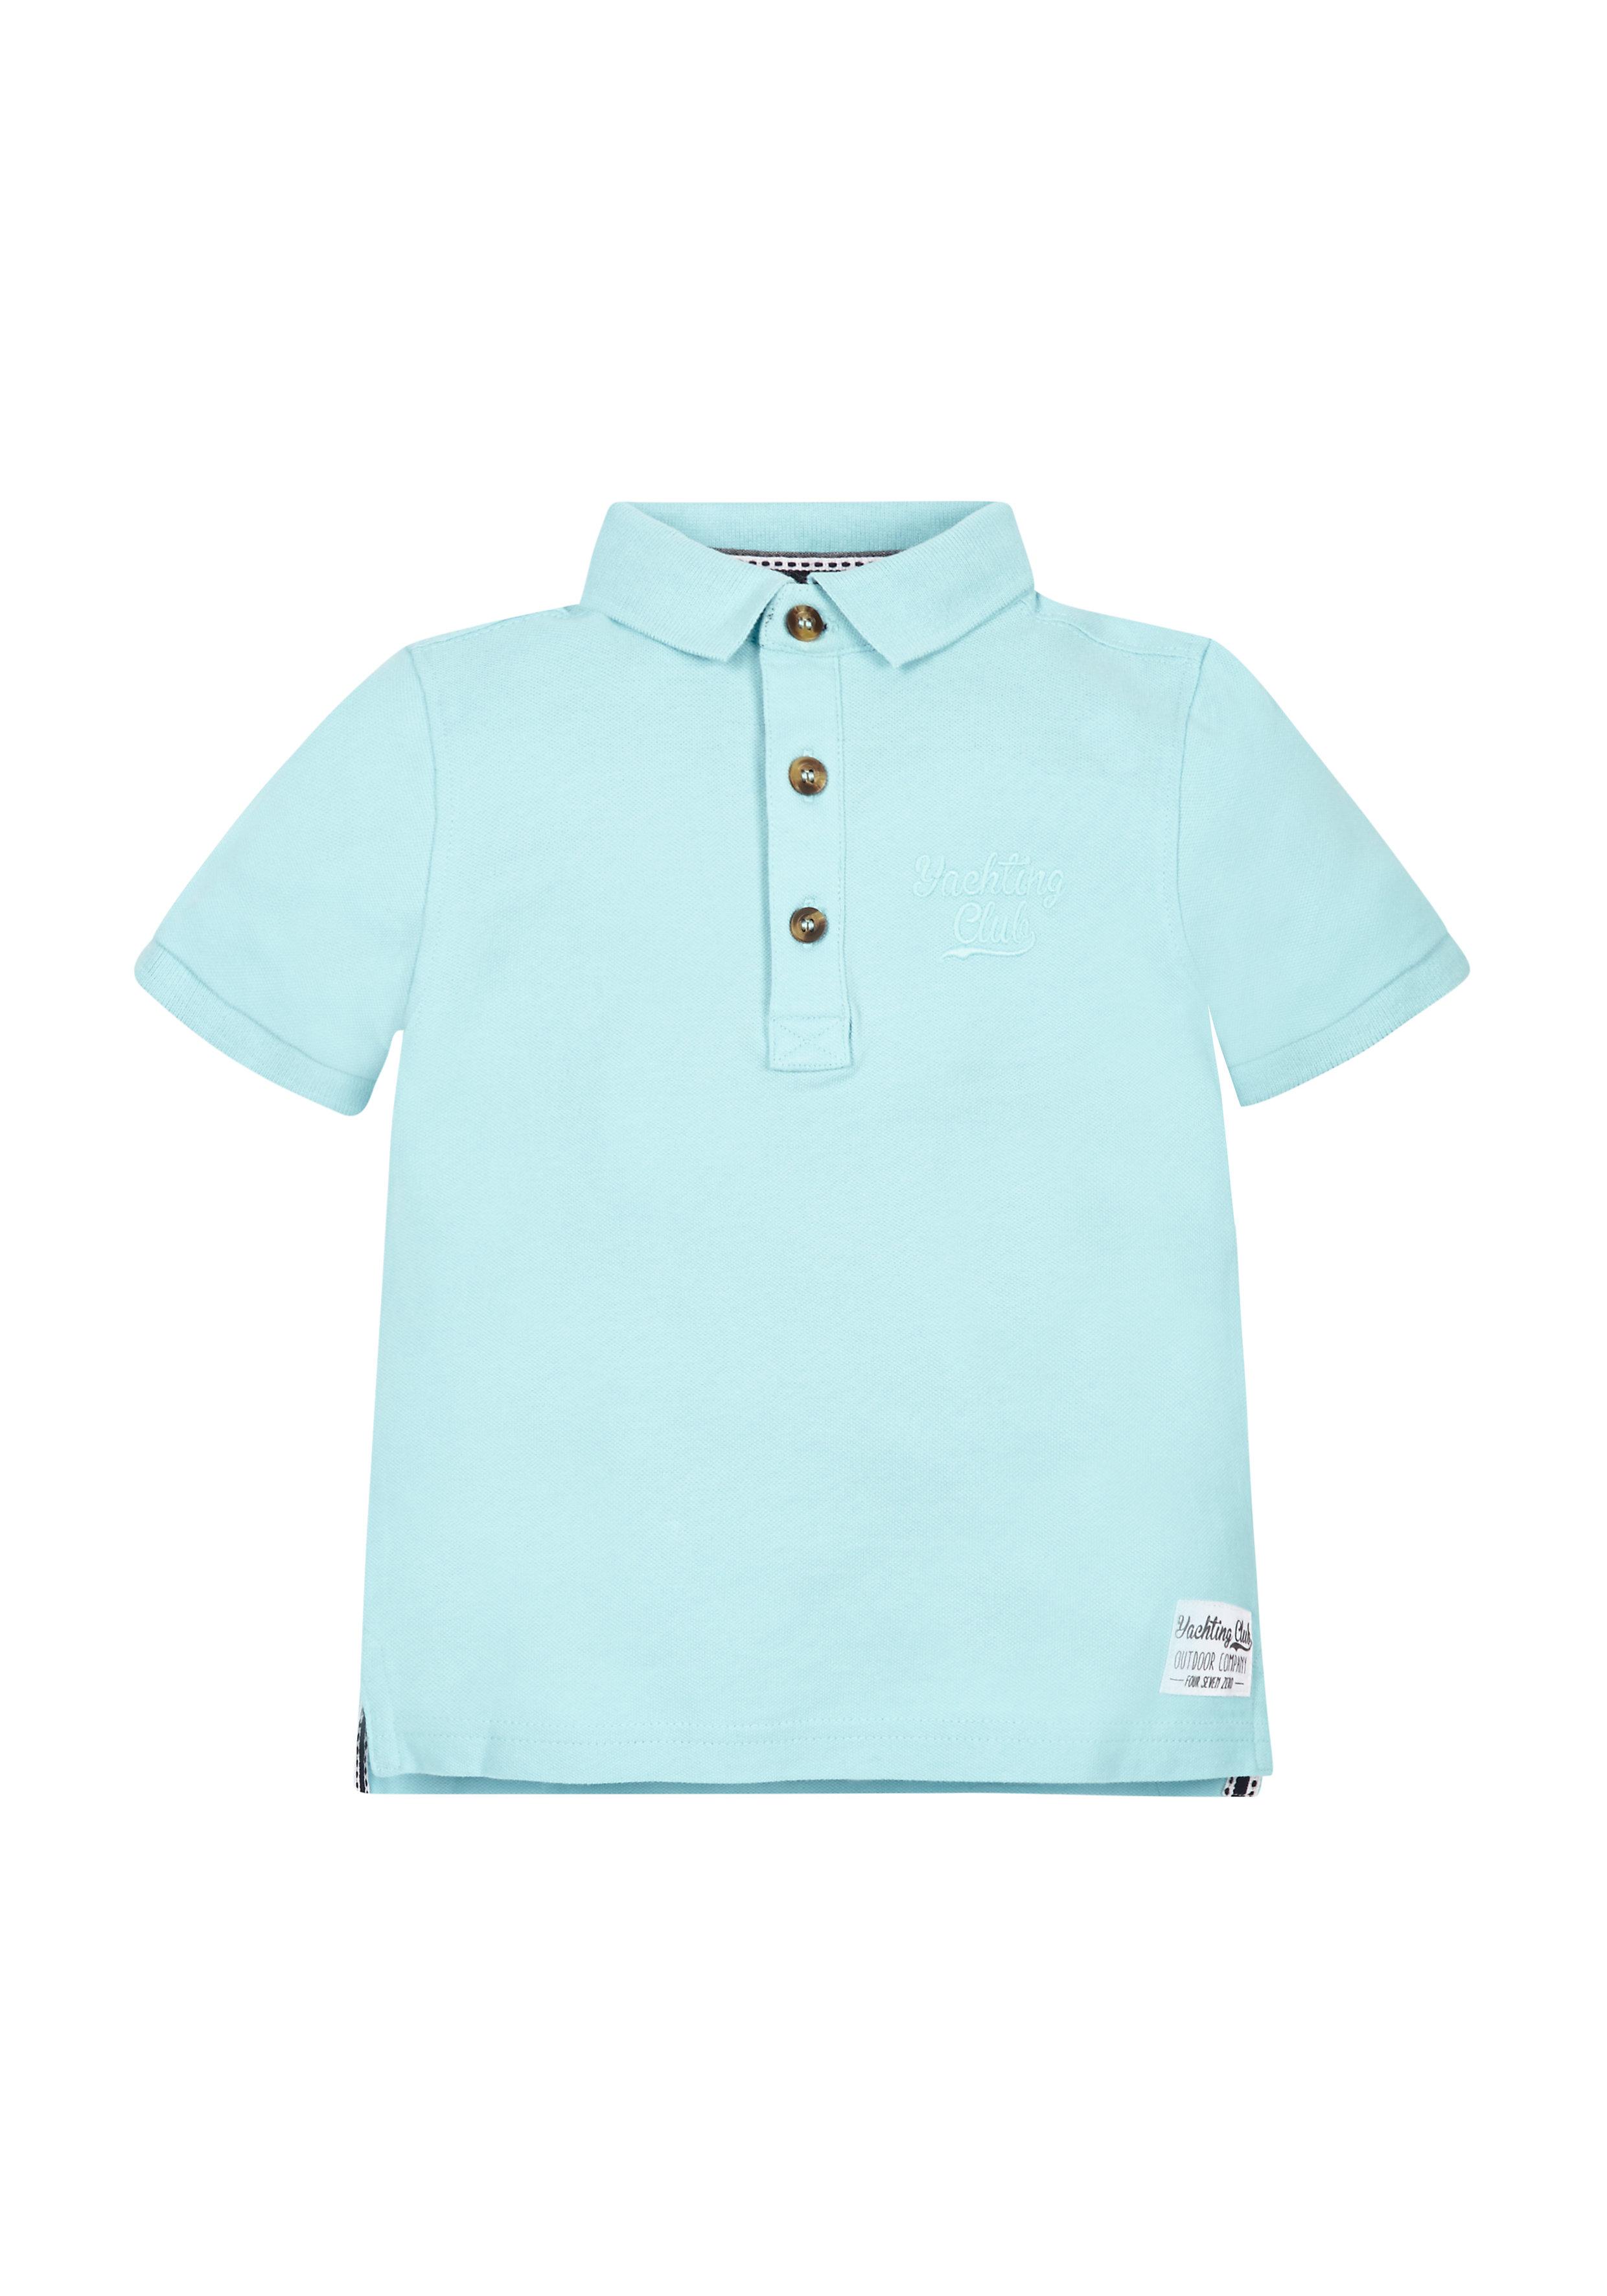 Mothercare   Boys Polo Shirt - Turq